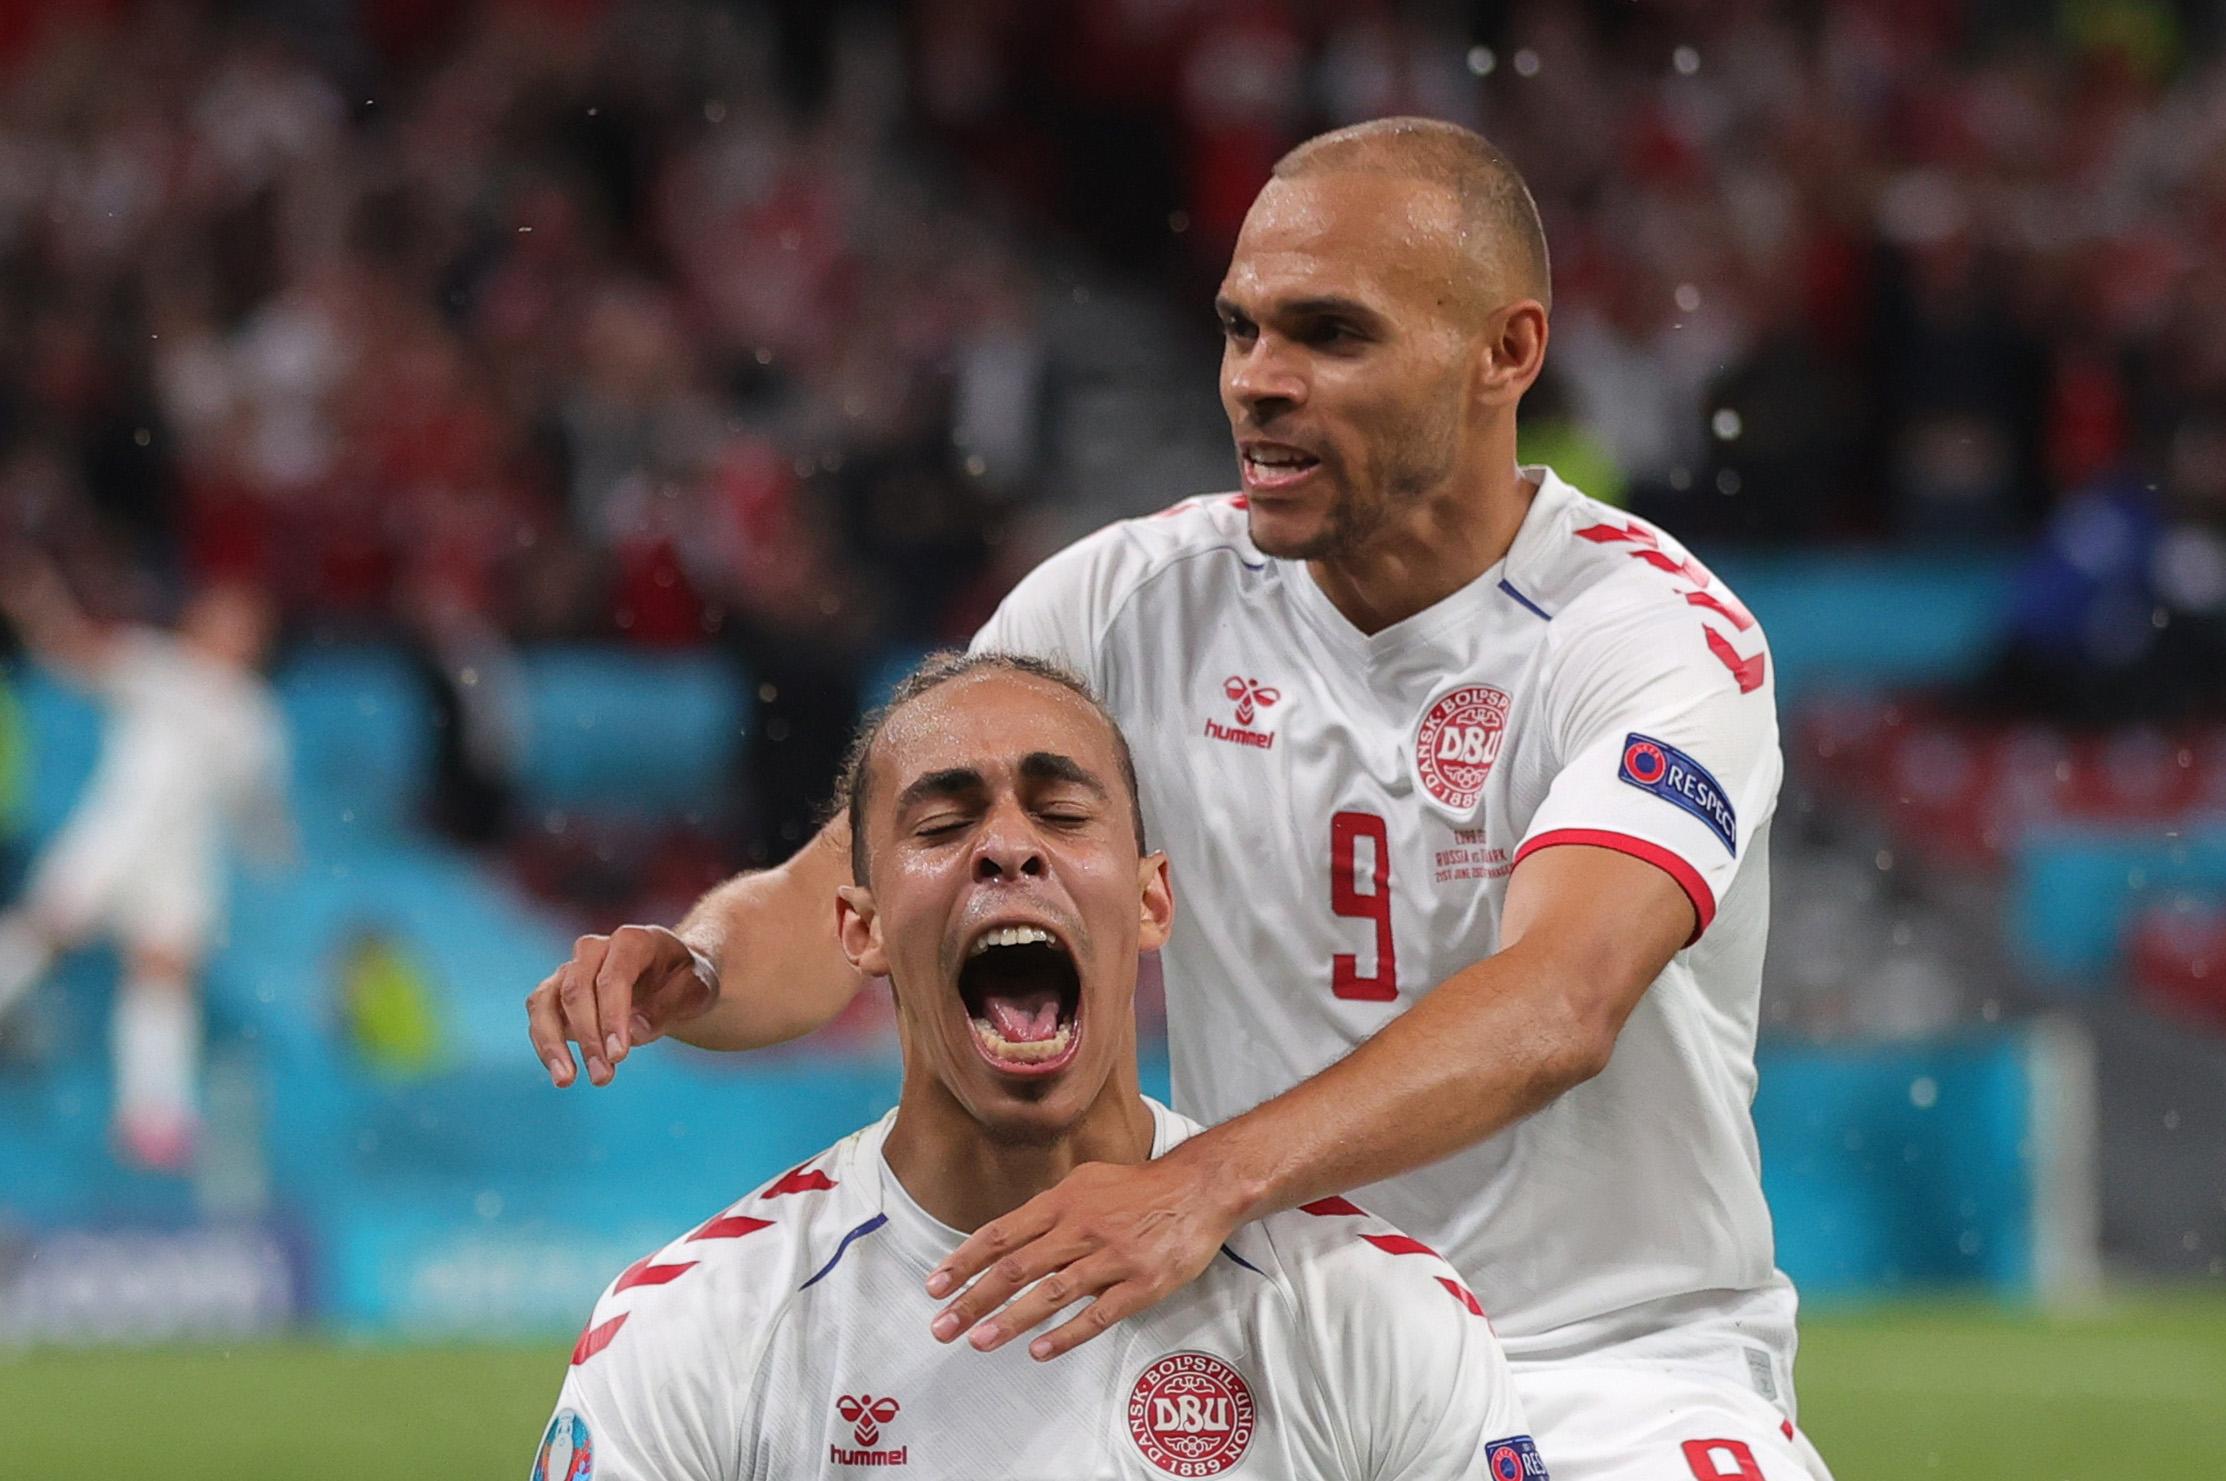 Euro 2020: Τραγικό λάθος της ρωσικής άμυνας που «τιμώρησε» ο Πόουλσεν – Μείωση με πέναλτι του Τζιούμπα